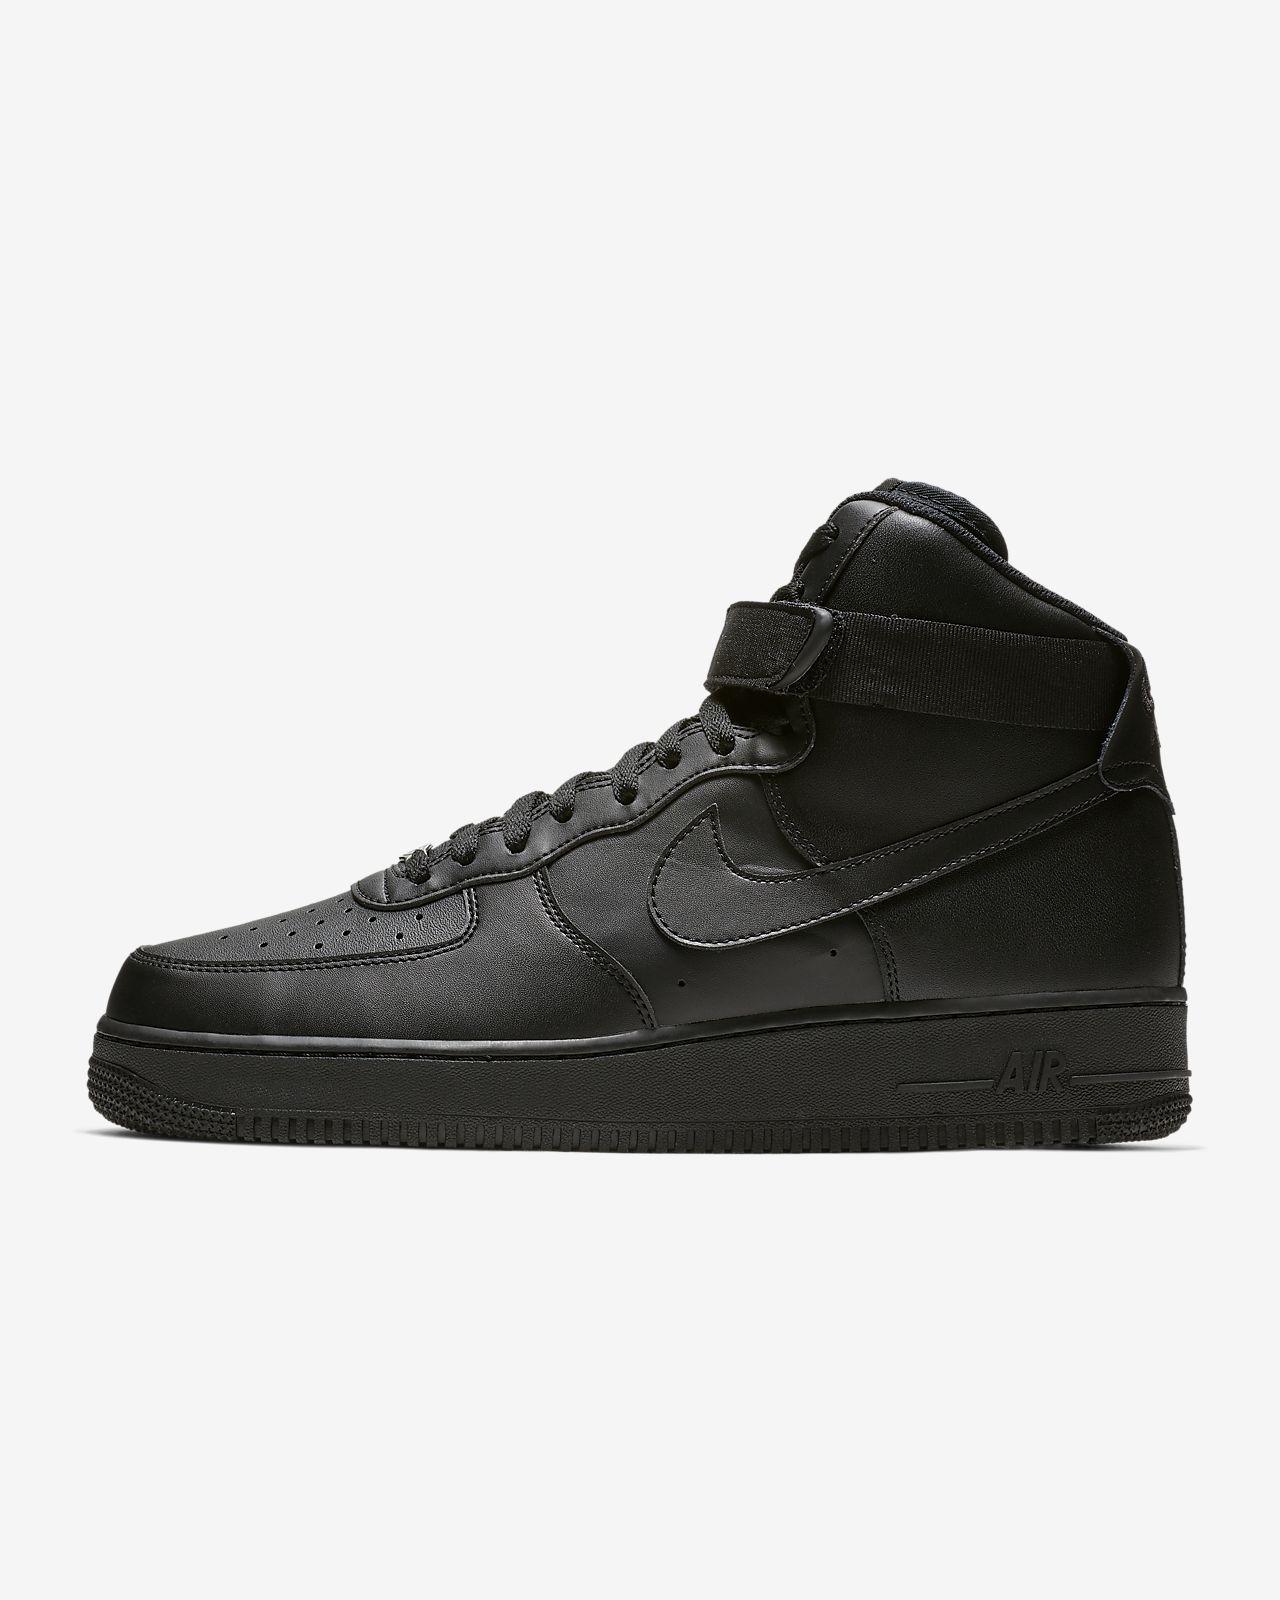 Calzado para hombre Nike Air Force 1 '07 High